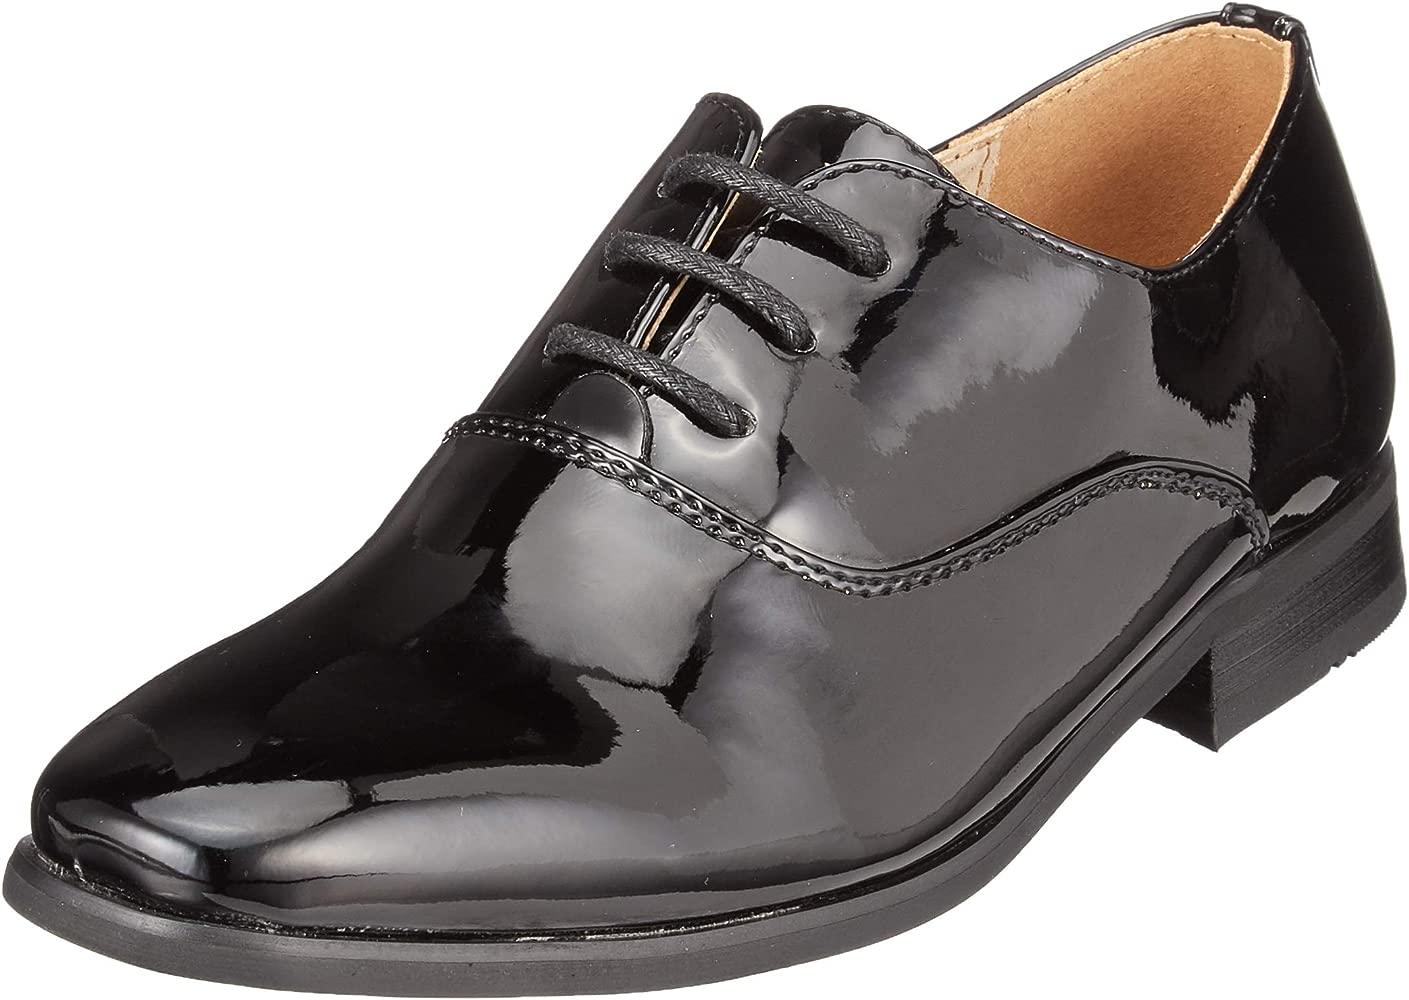 Goor - Zapatos de Charol Modelo Oxford niños- Boda/Fiesta/Comunión